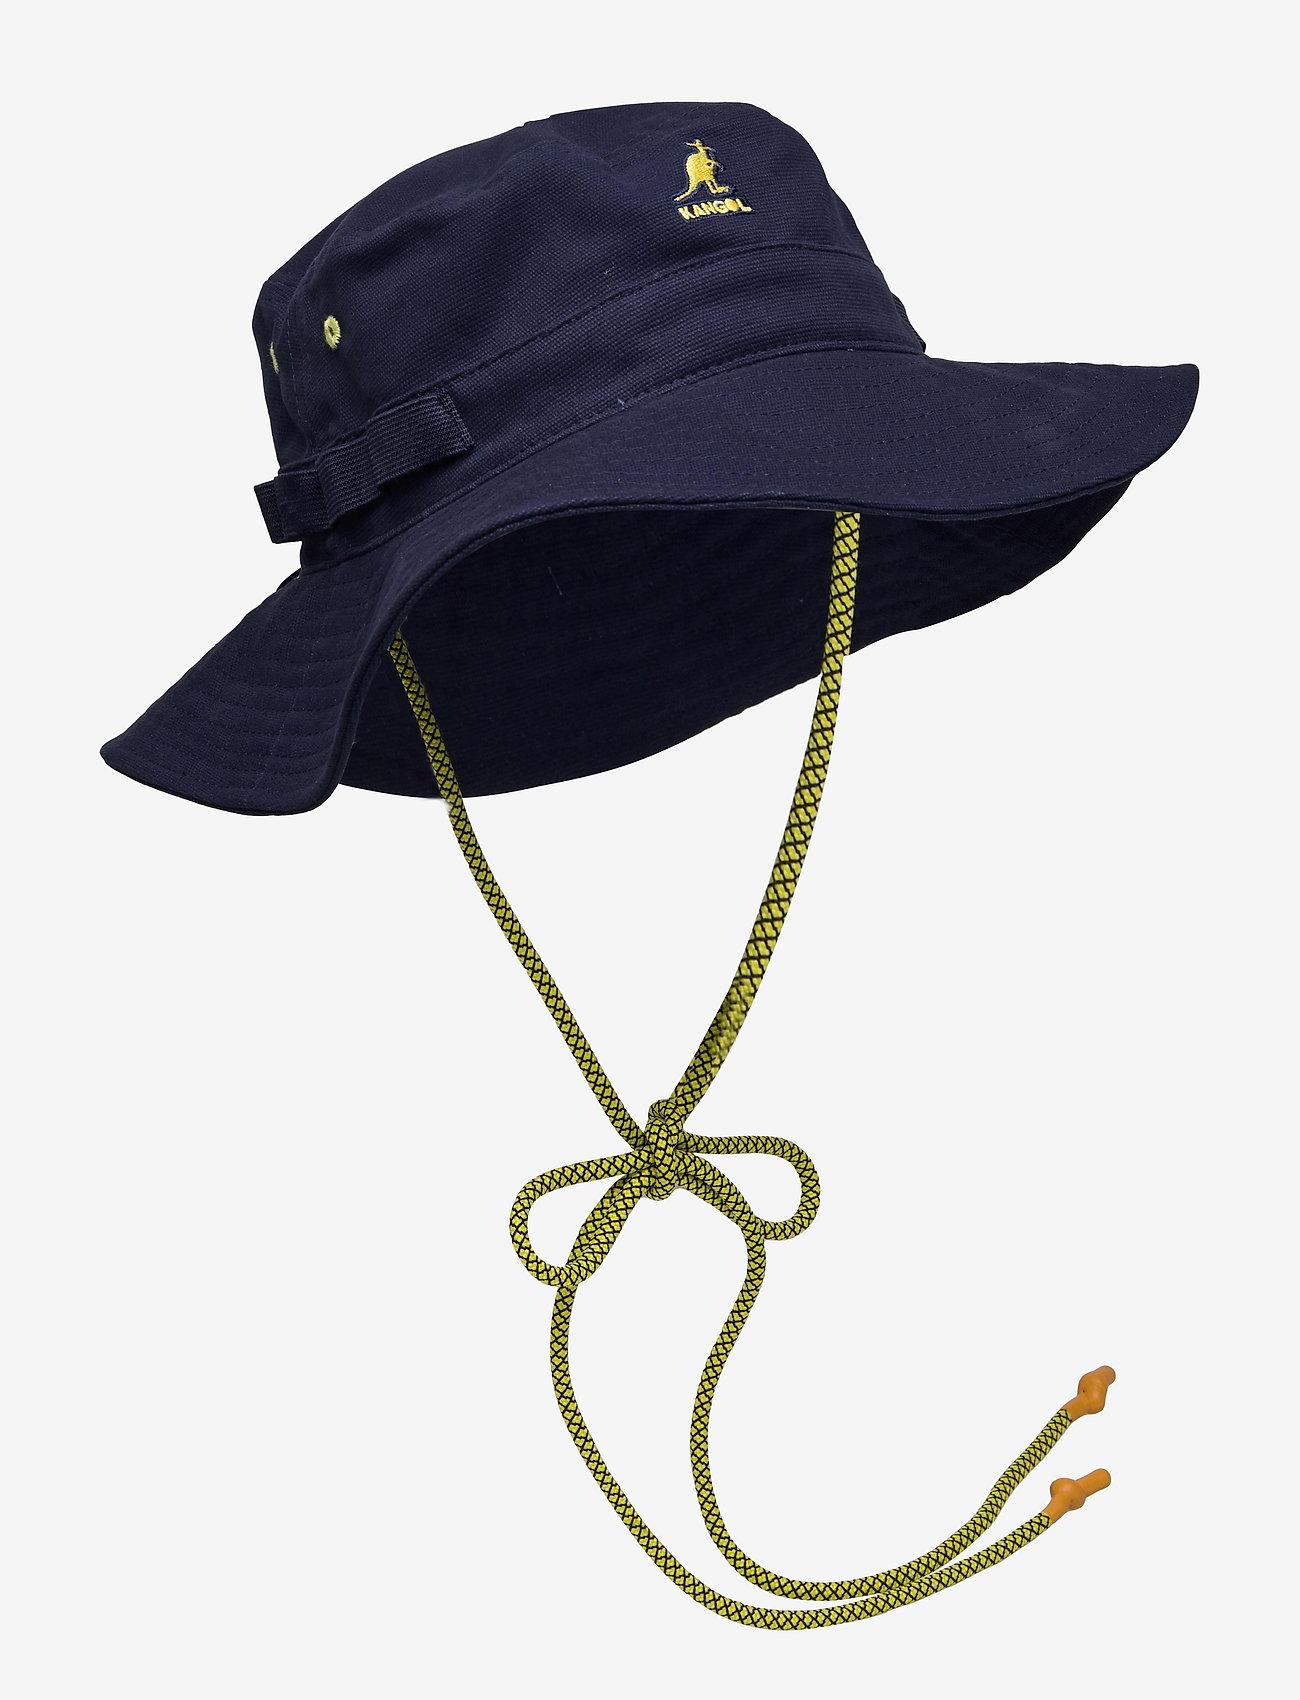 Kangol - KG UTILITY CORDS JUNGLE HAT - navy - 0